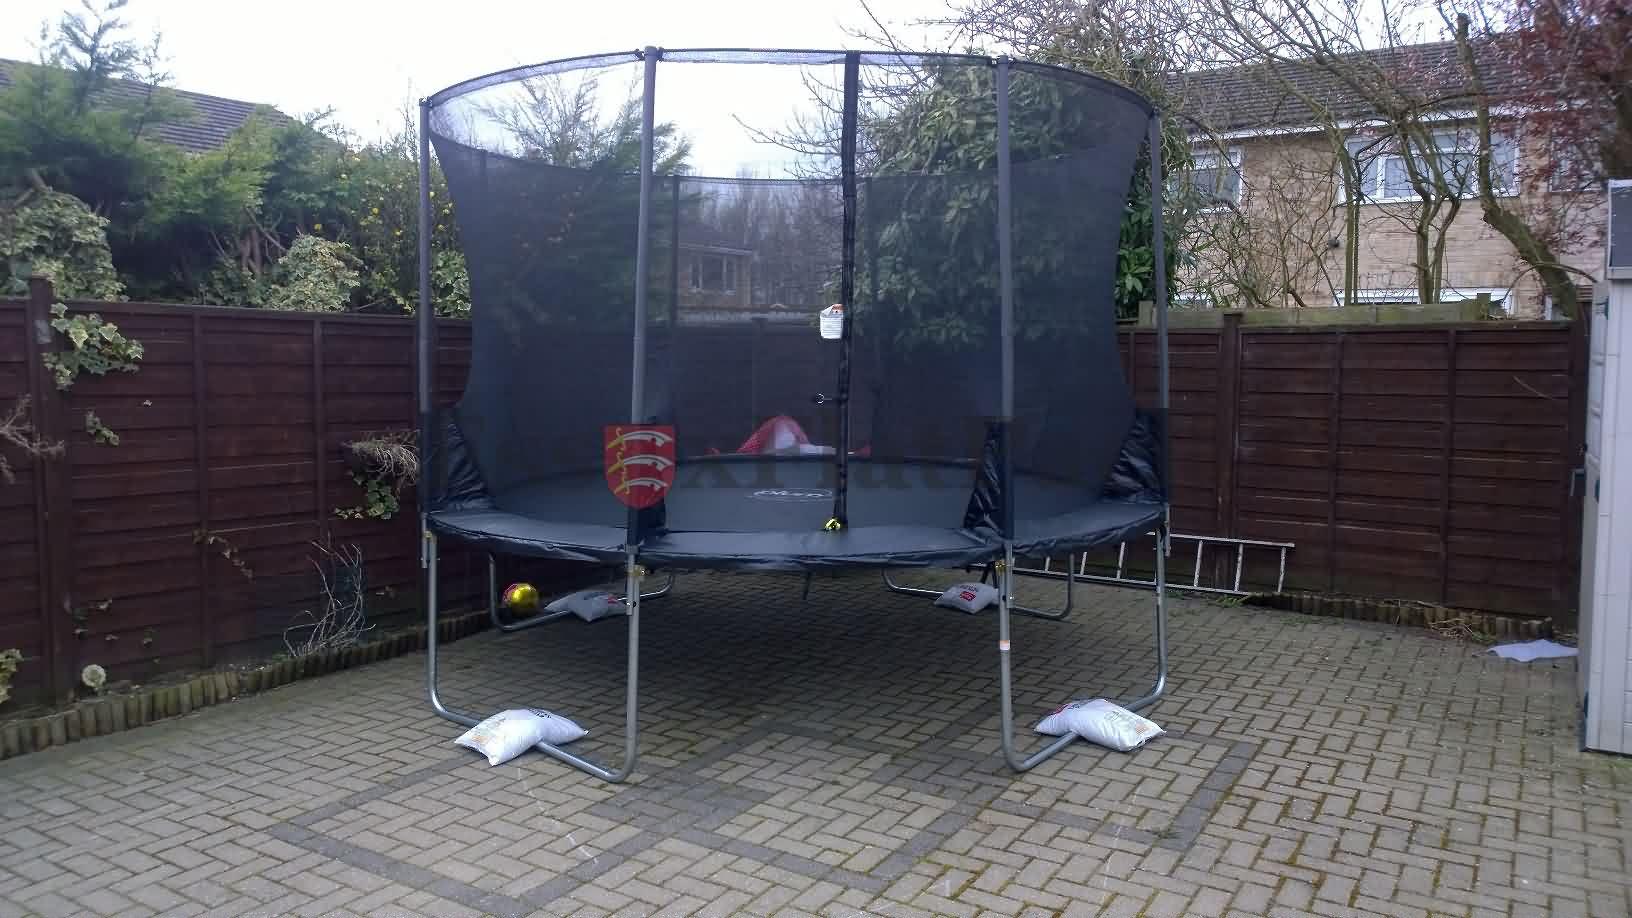 essexflatpack-trampolines-20160324104056.jpg